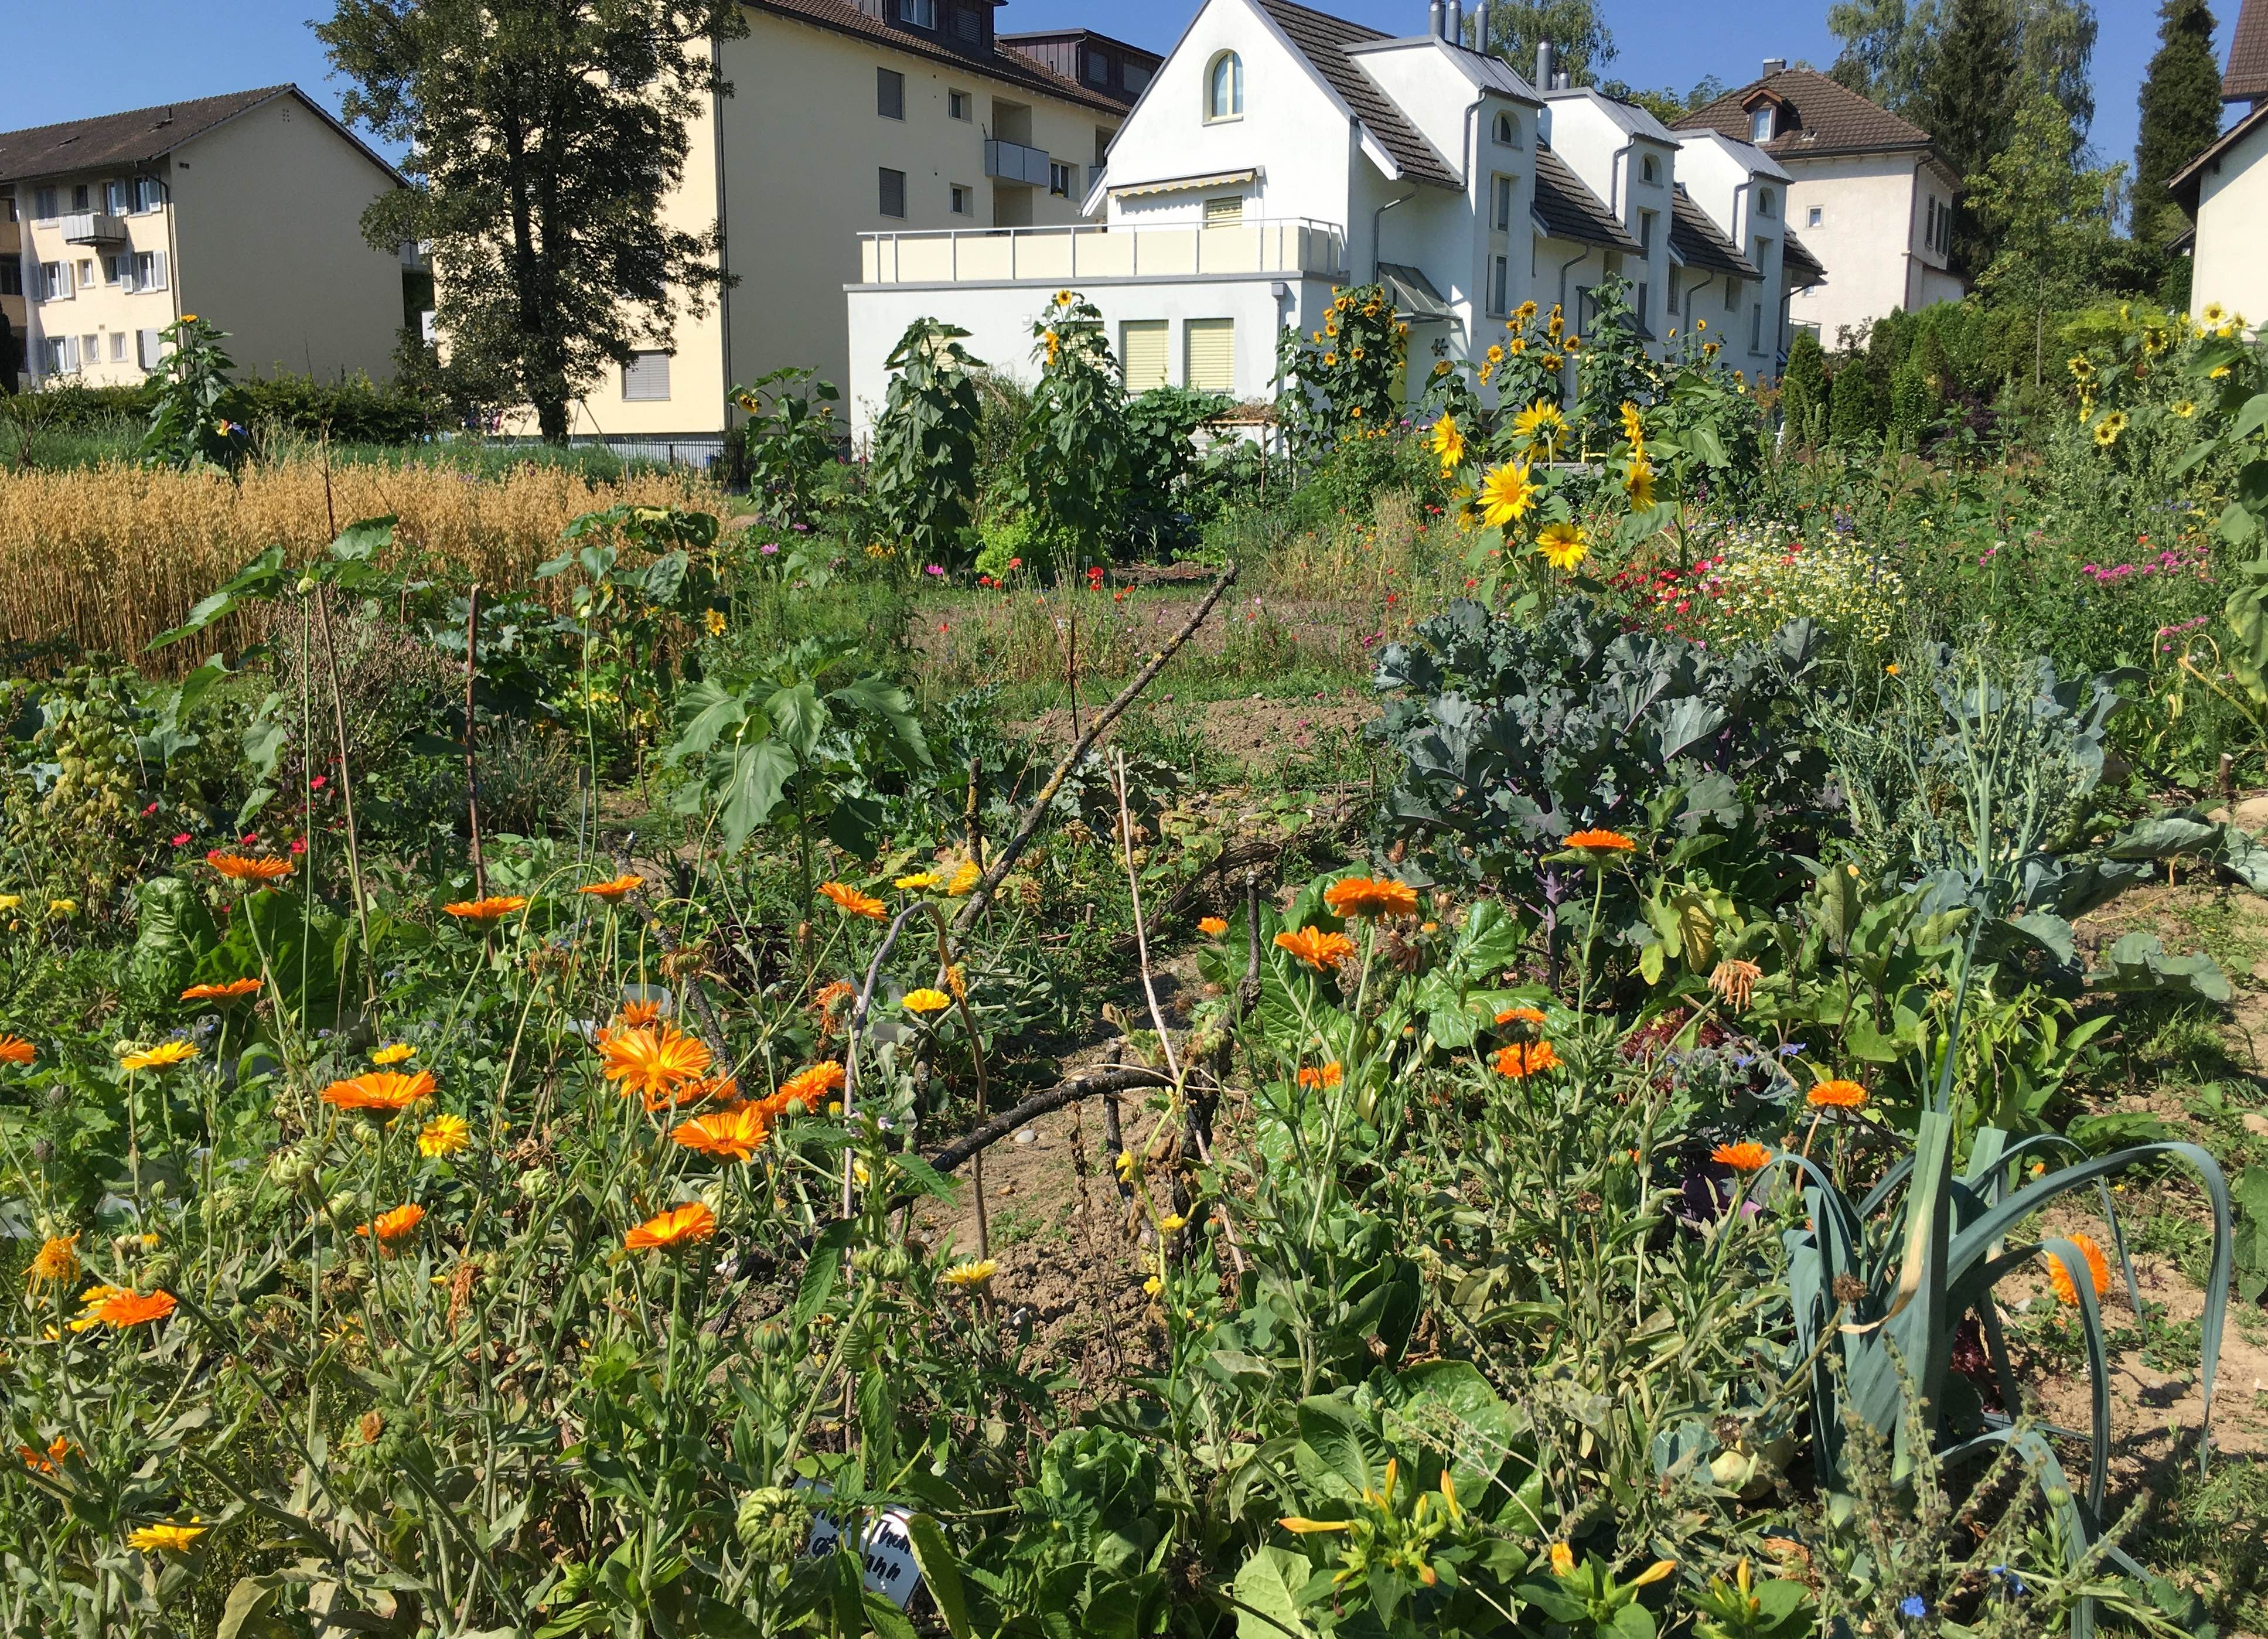 2020-07-28 Ogif Garten, 6